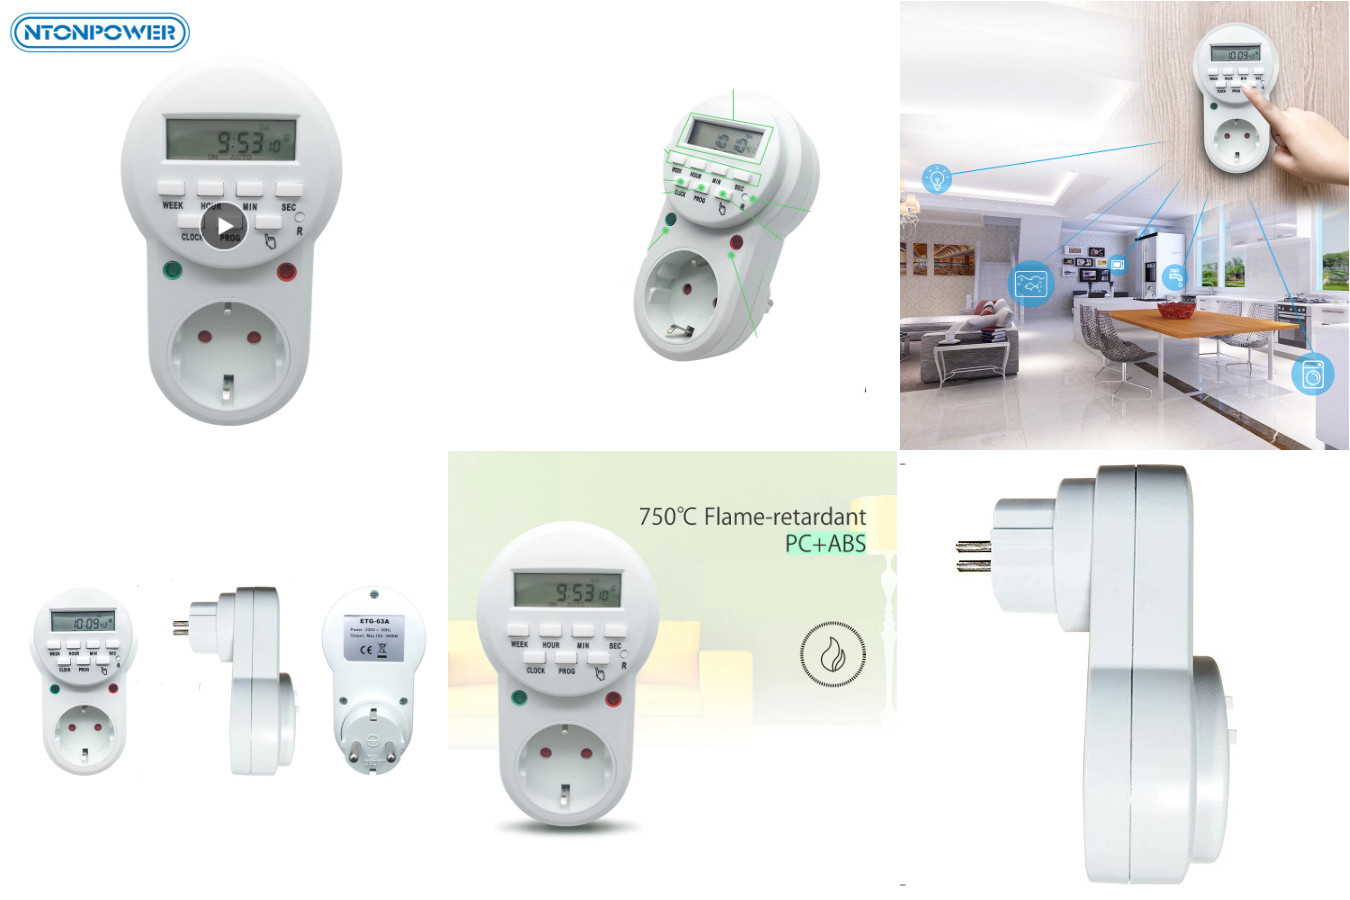 Розетка с таймером — NTONPOWER Smart Power Socket ETG-63A